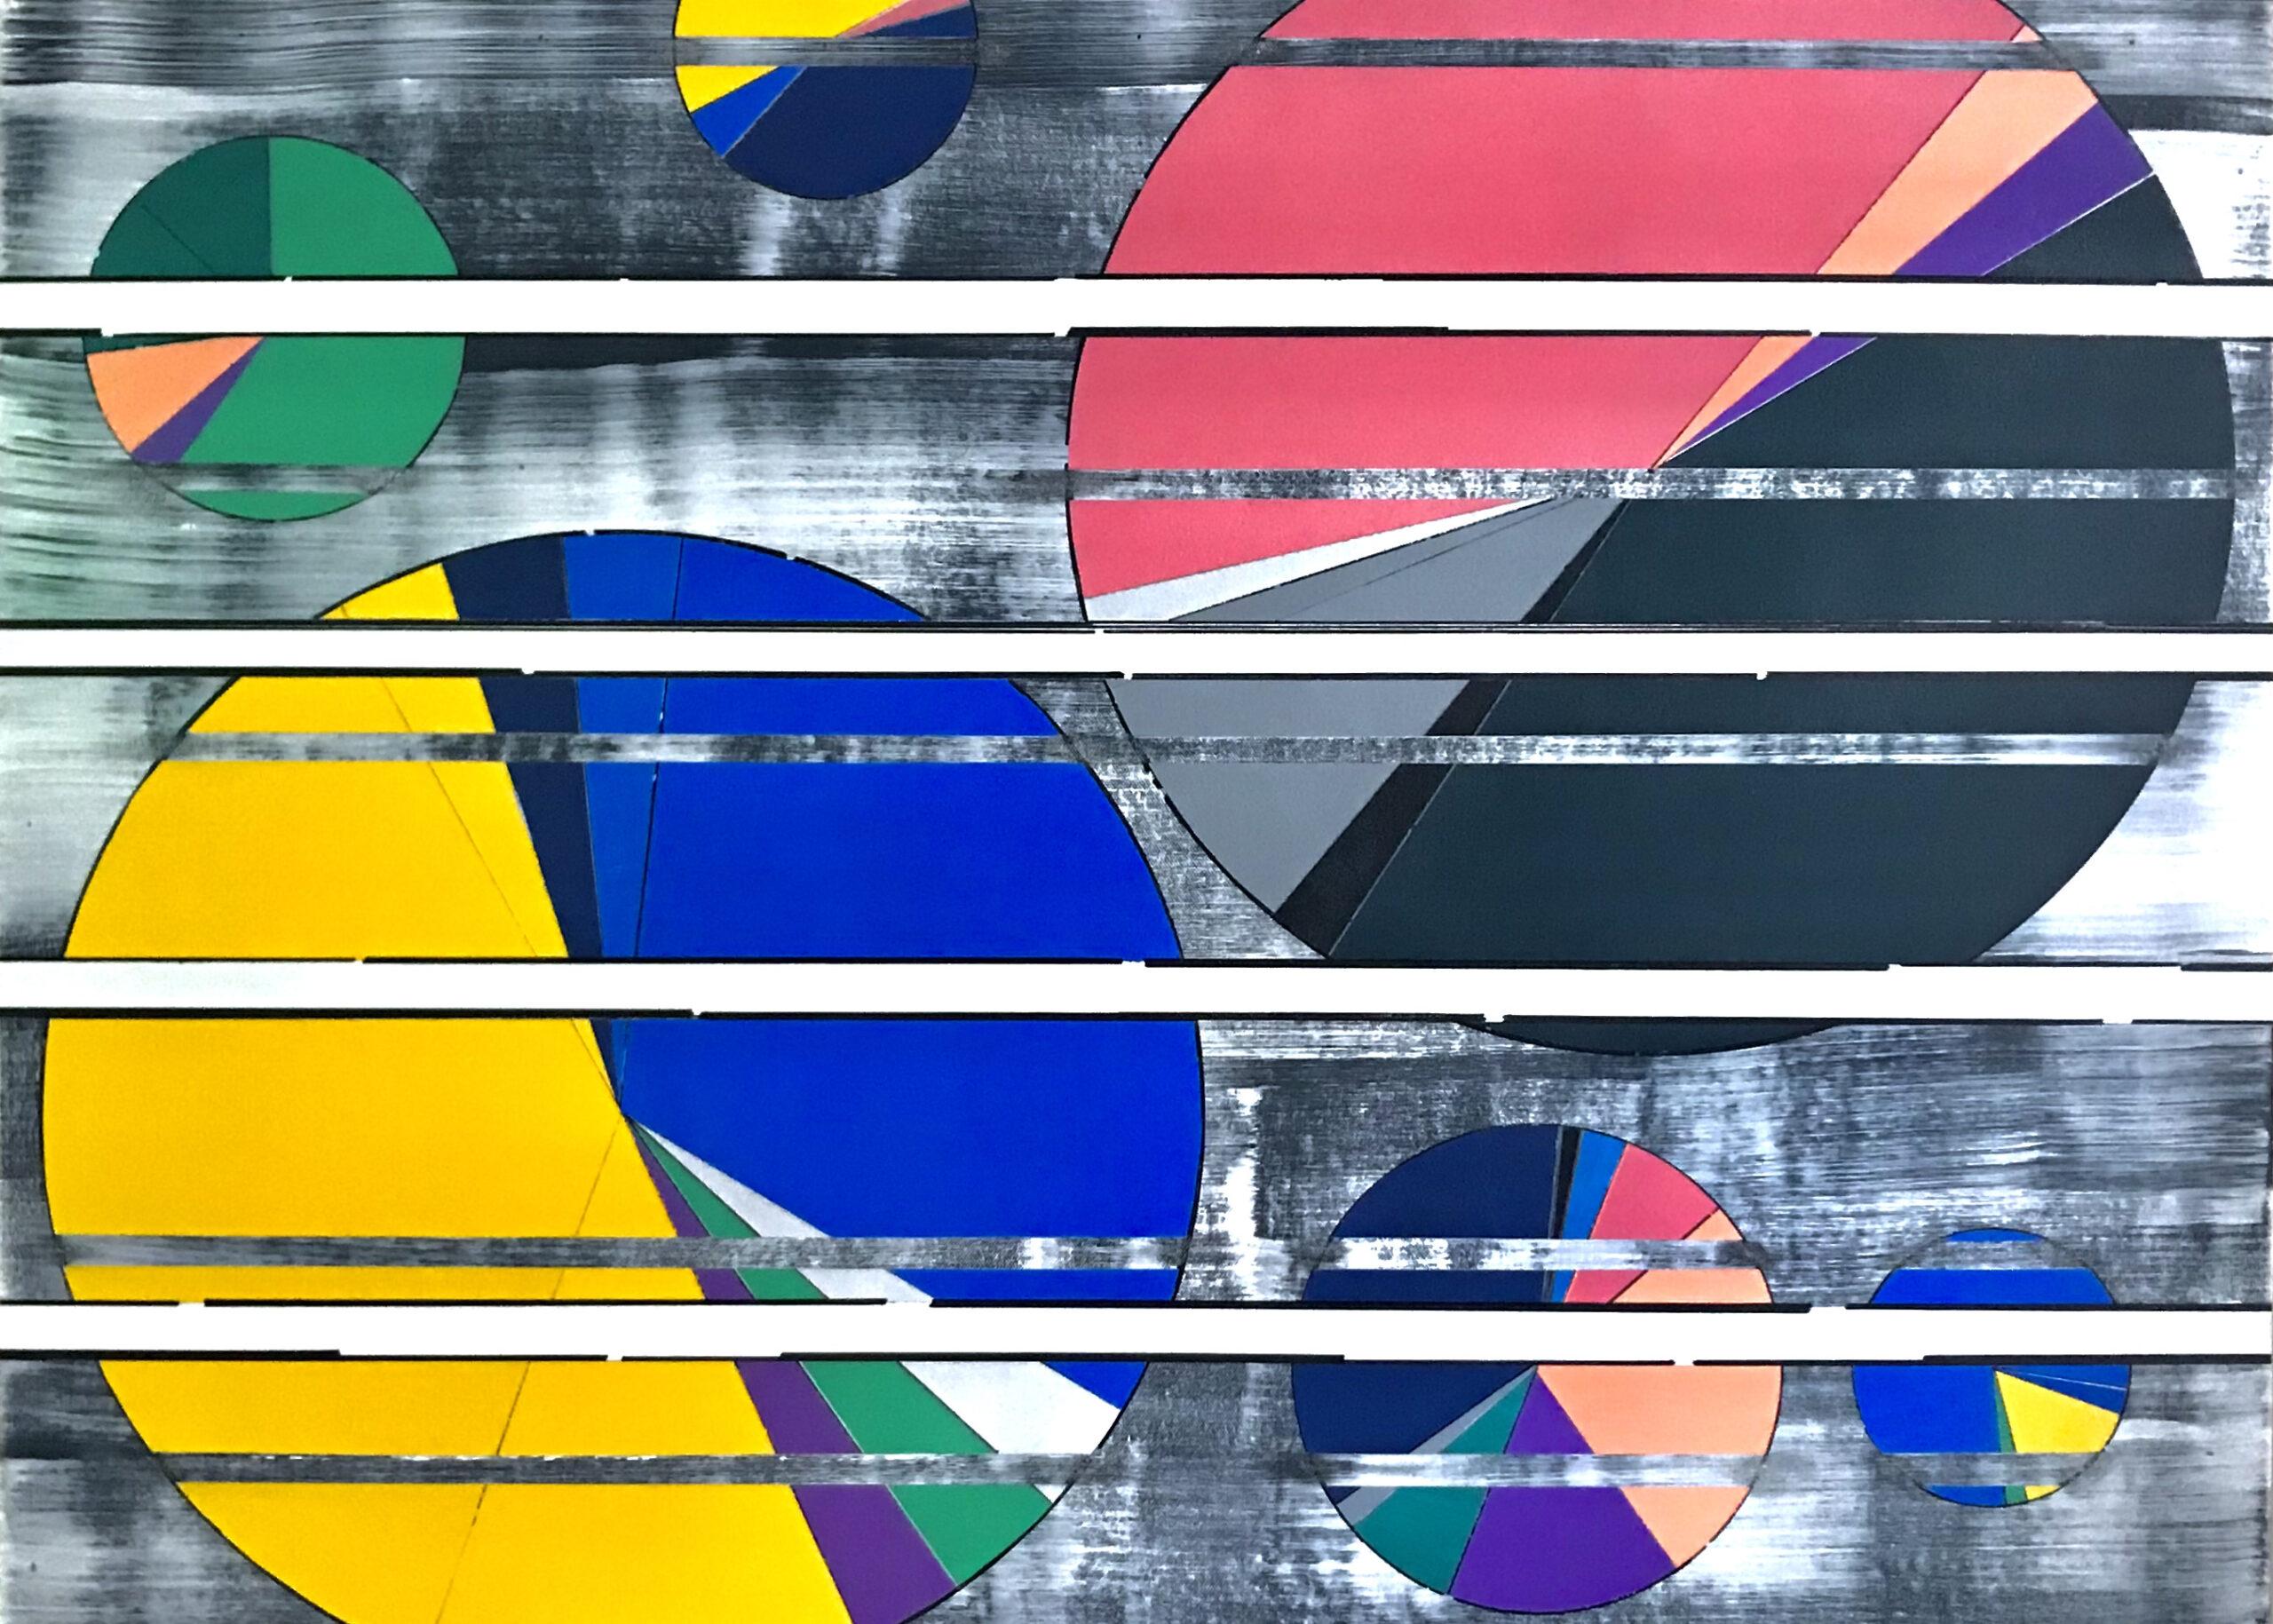 ARTNEWS 4   Daniel Engelberg   Gihyun Park   27.10. – 6.11.2021